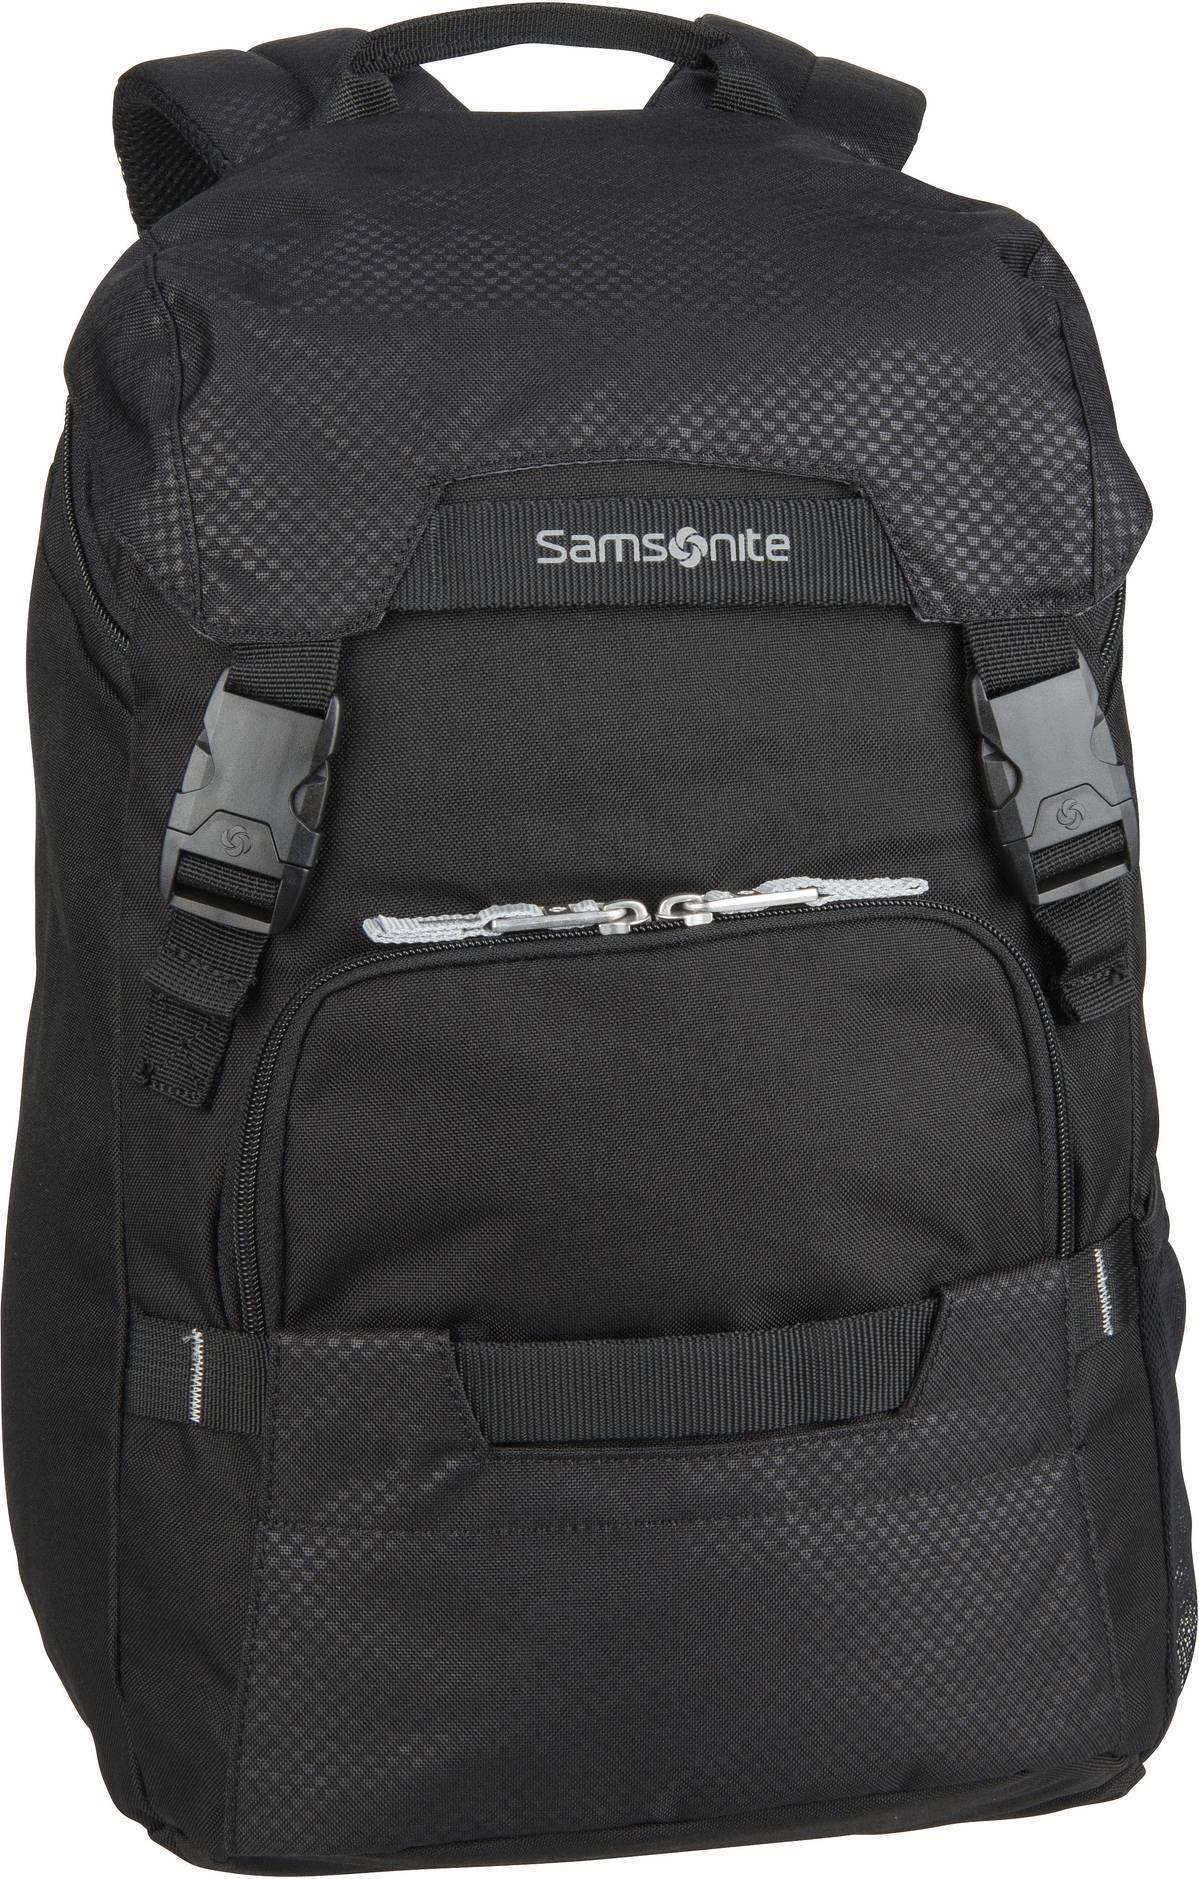 Rucksack / Daypack Sonora Laptop Backpack M Black (23 Liter)